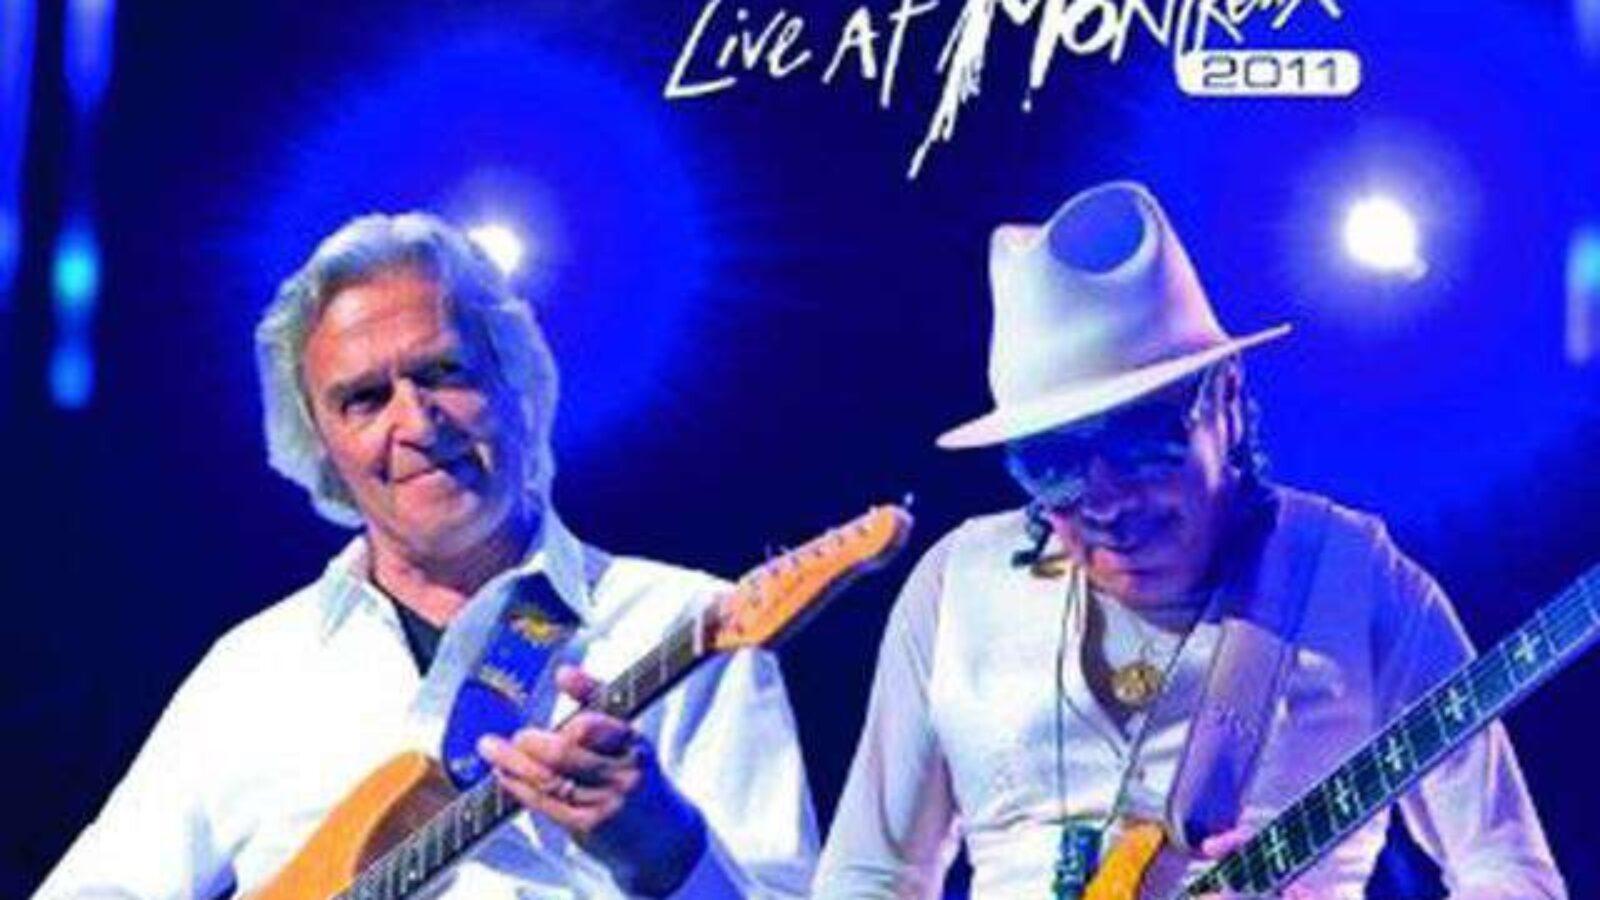 SANTANA & MCLAUGHLIN – Invitation To Illumination – Live At Montreux 2011 (DVD/Blu-ray)